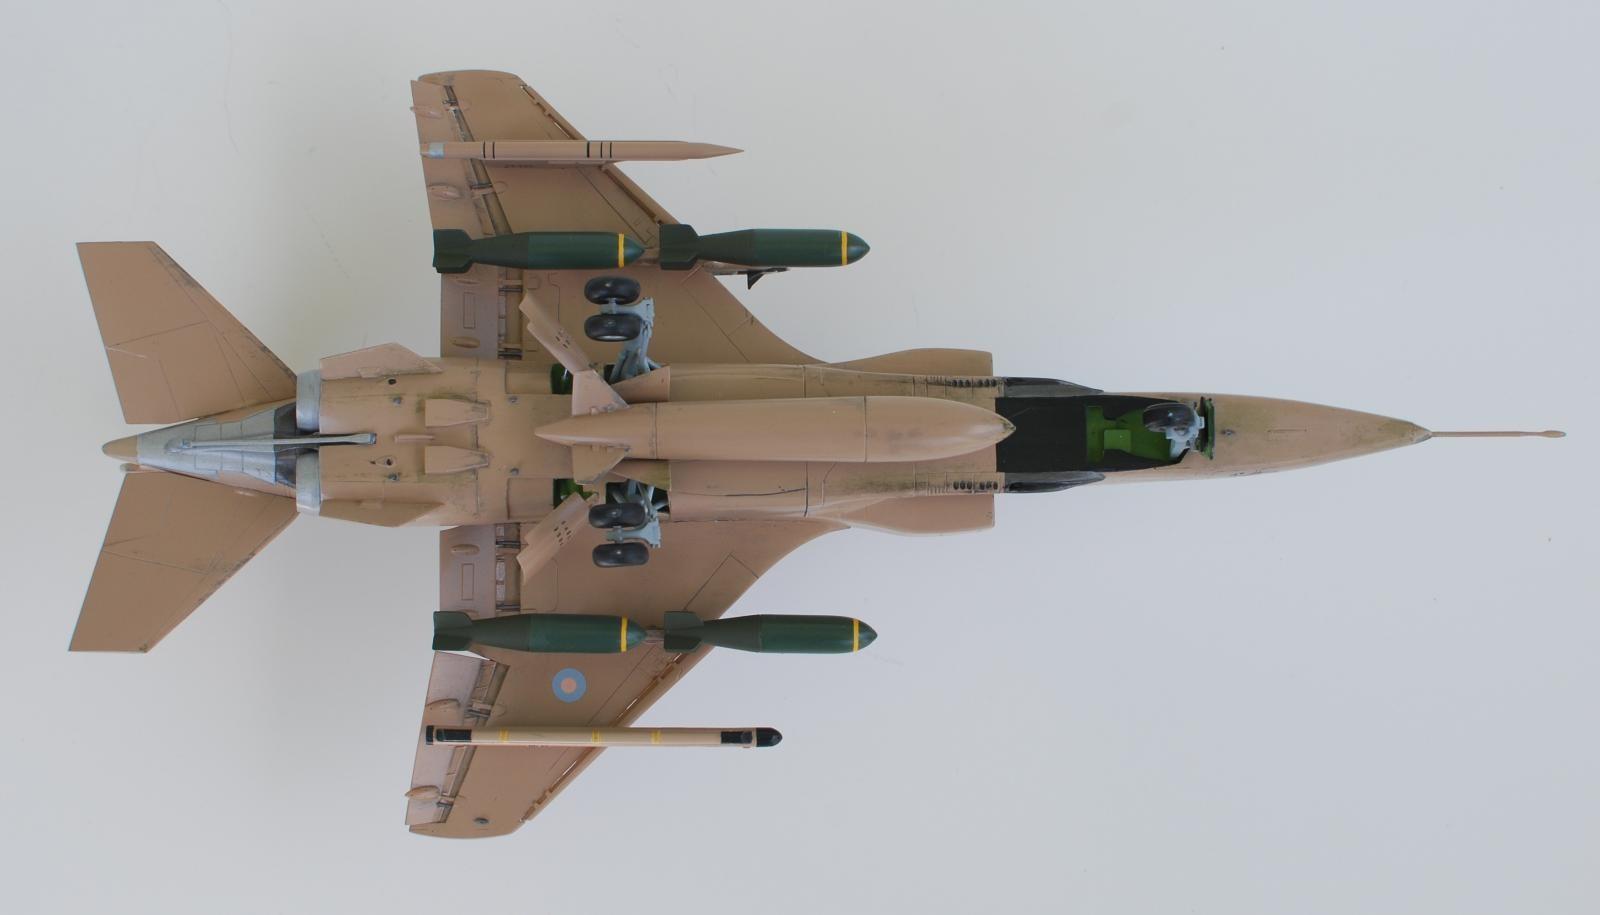 23 additional images. Click to enlarge. & 1/48 Airfix Sepecat Jaguar Operation Granby | iModeler